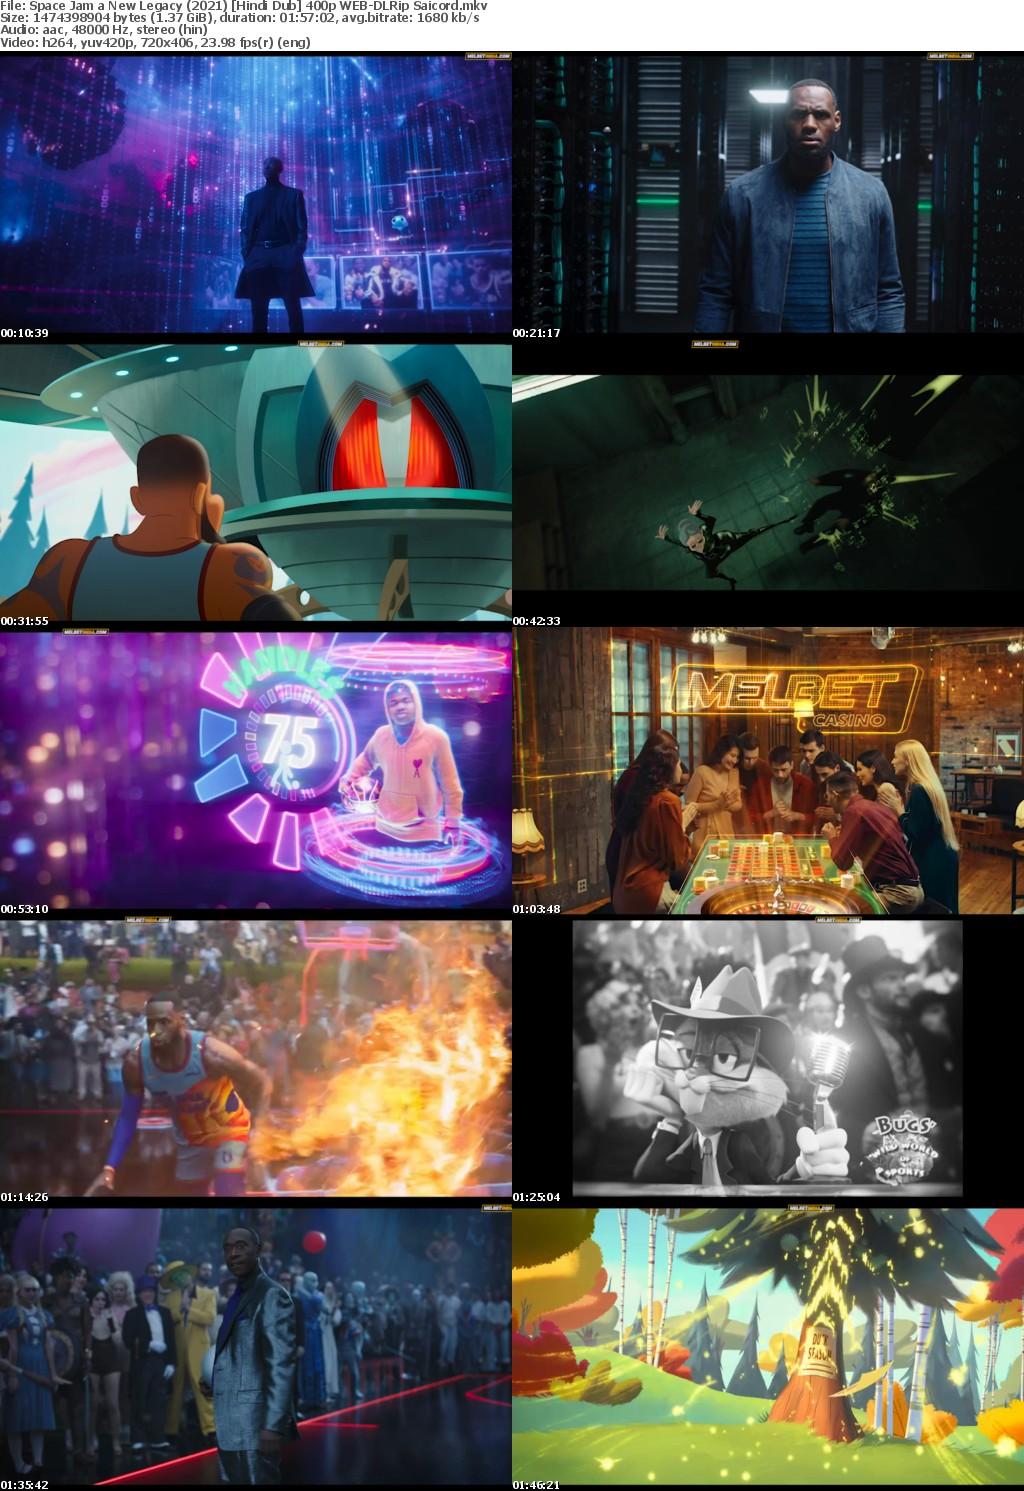 Space Jam a New Legacy (2021) Hindi Dub WEB-DLRip Saicord